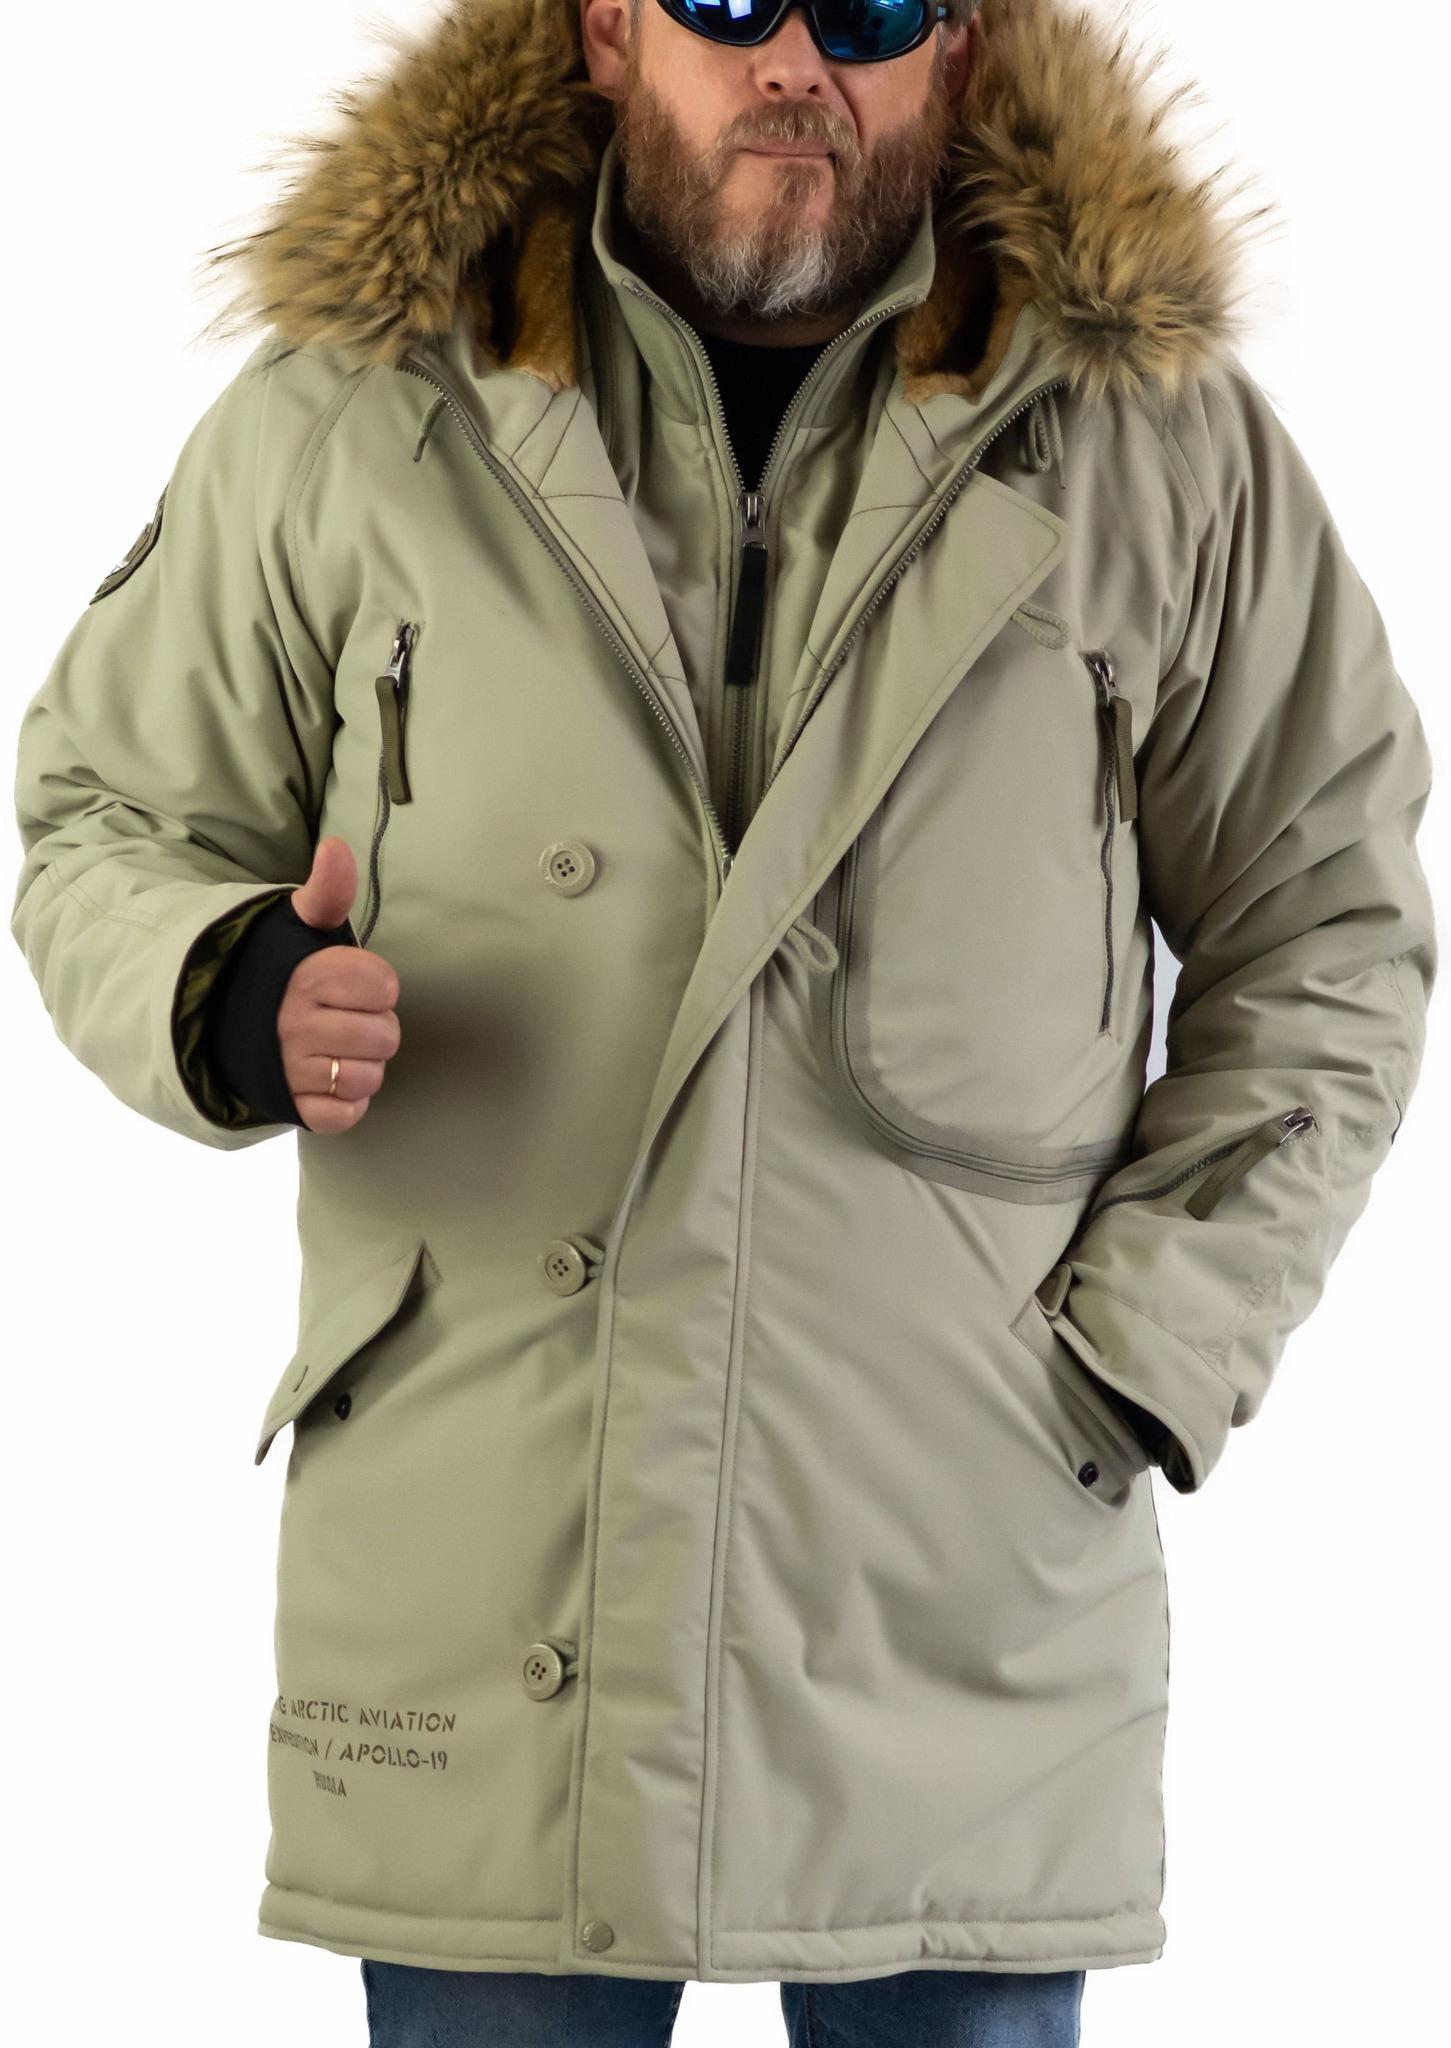 Куртка мужская зимняя Apolloget Expedition (хаки - silver green/olive)